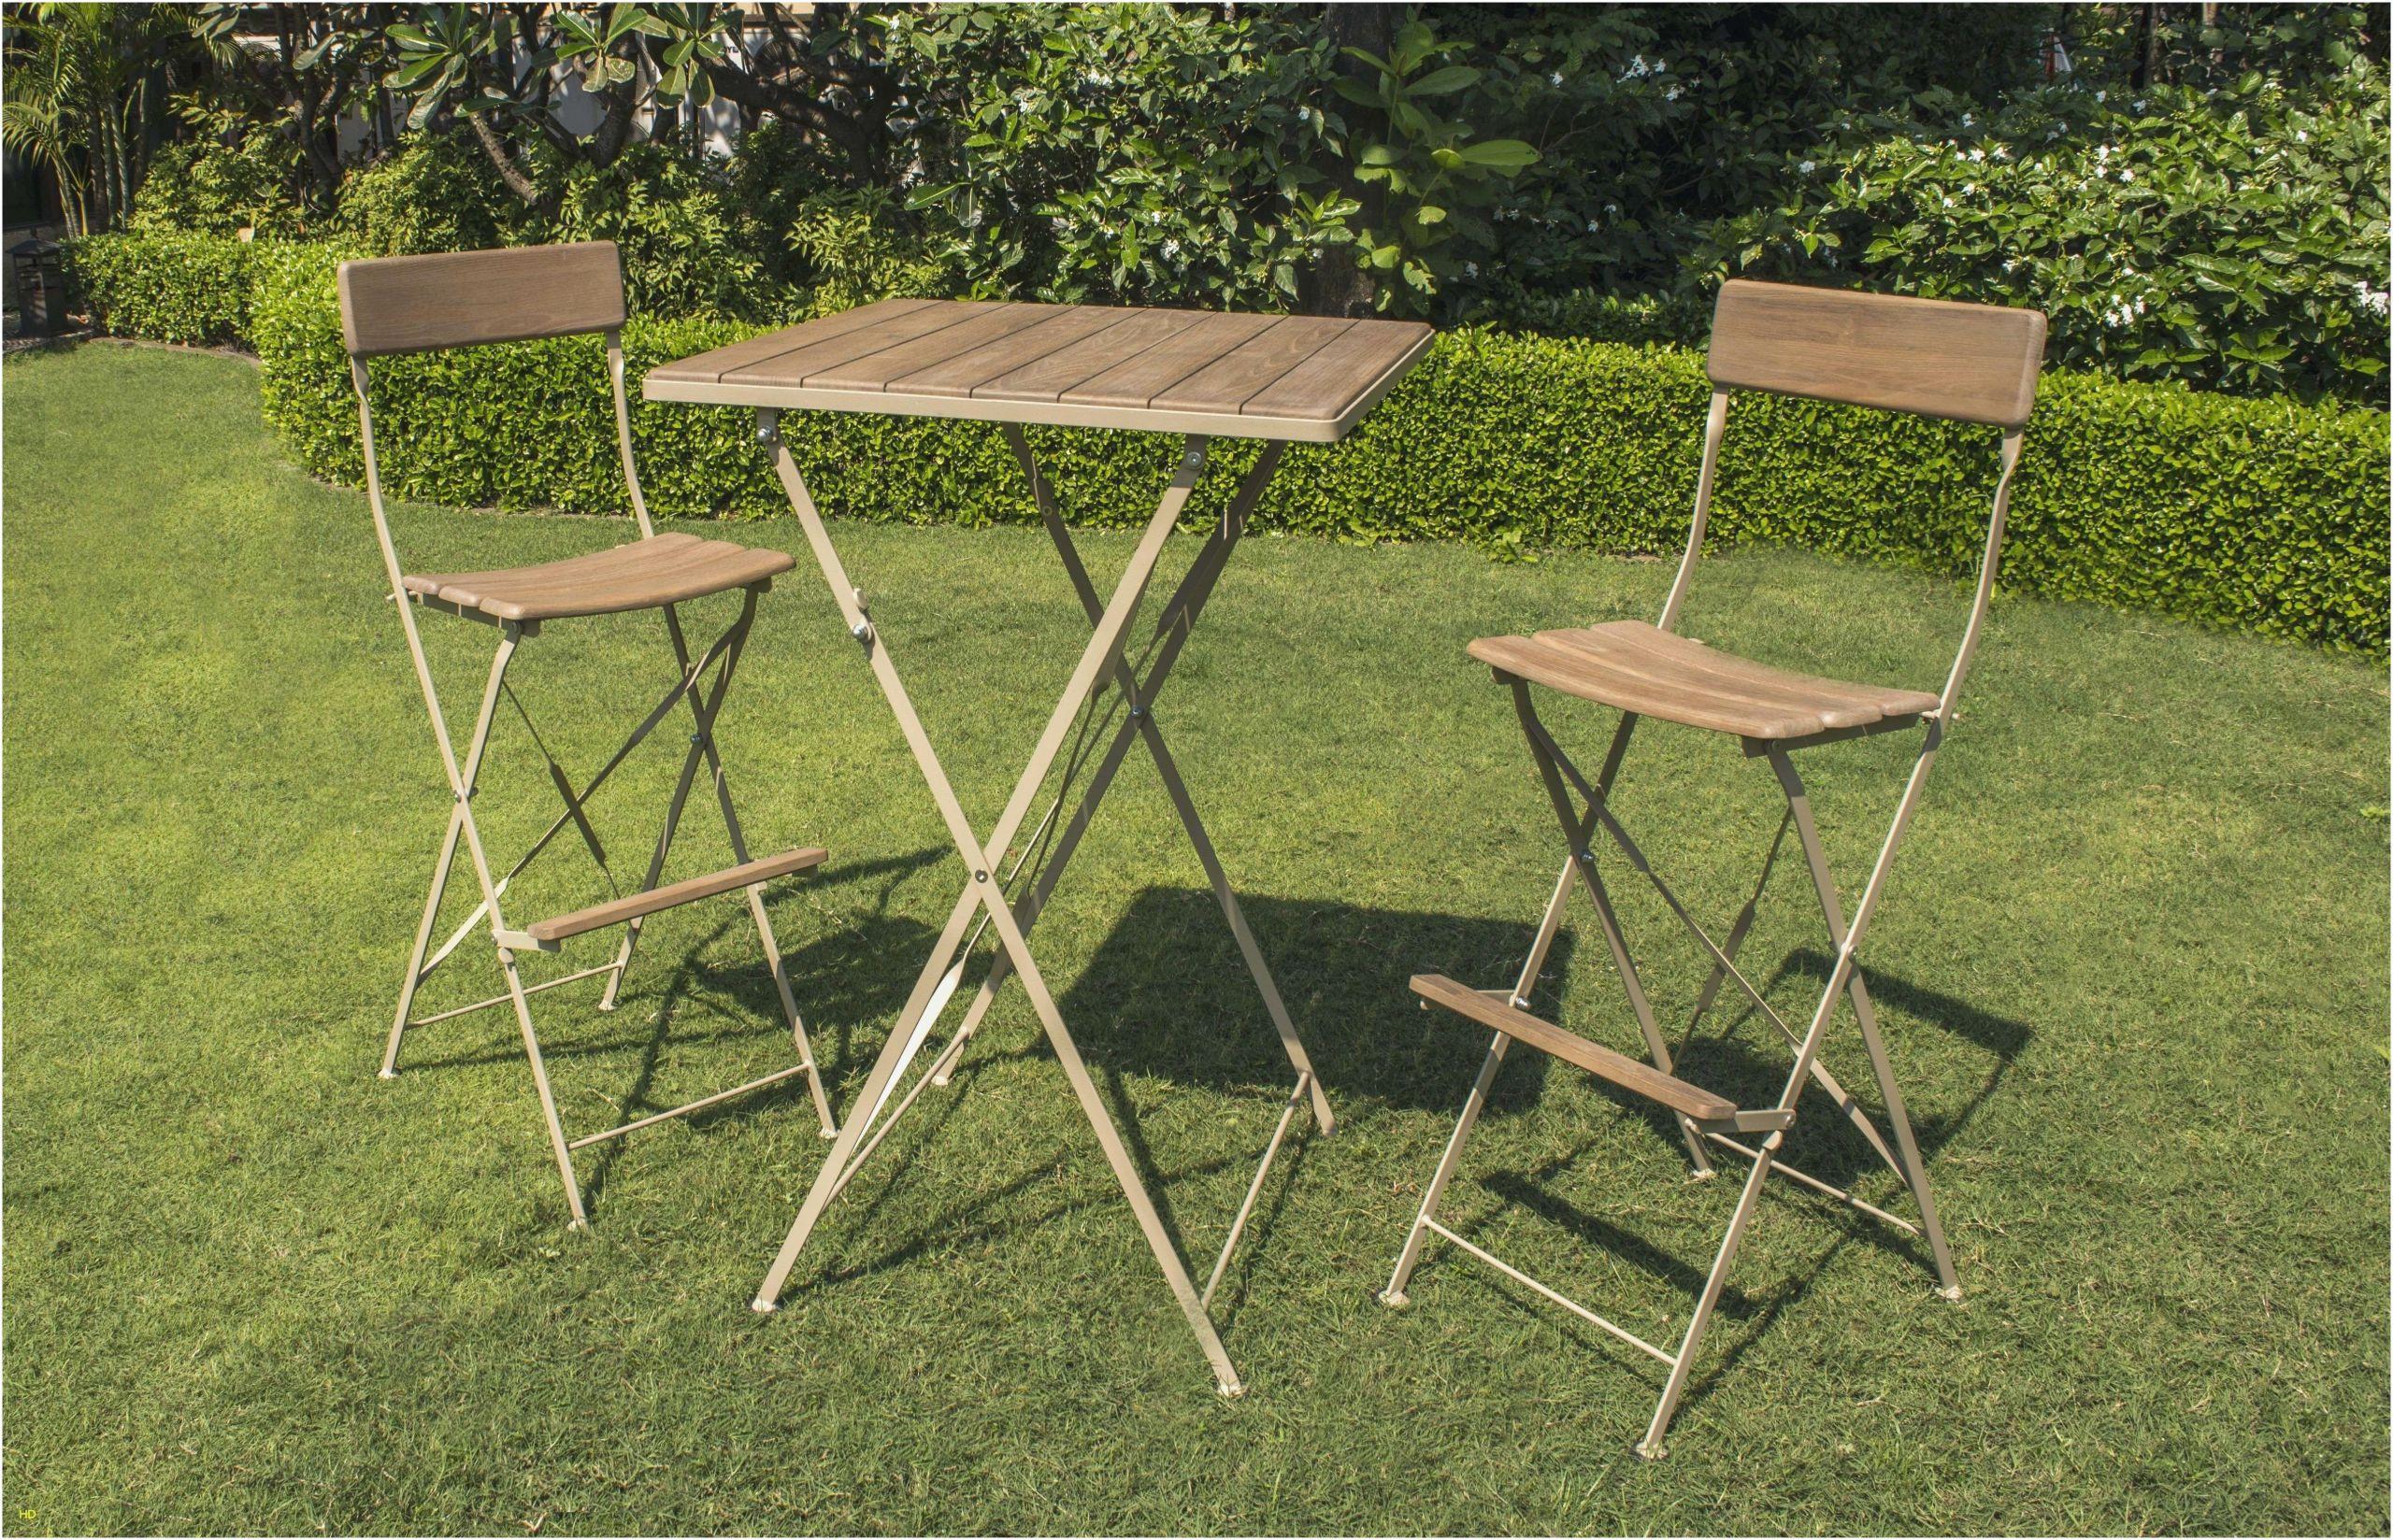 mobilier jardin castorama nouveau table et chaise de jardin castorama castorama table basse fauteuil of mobilier jardin castorama